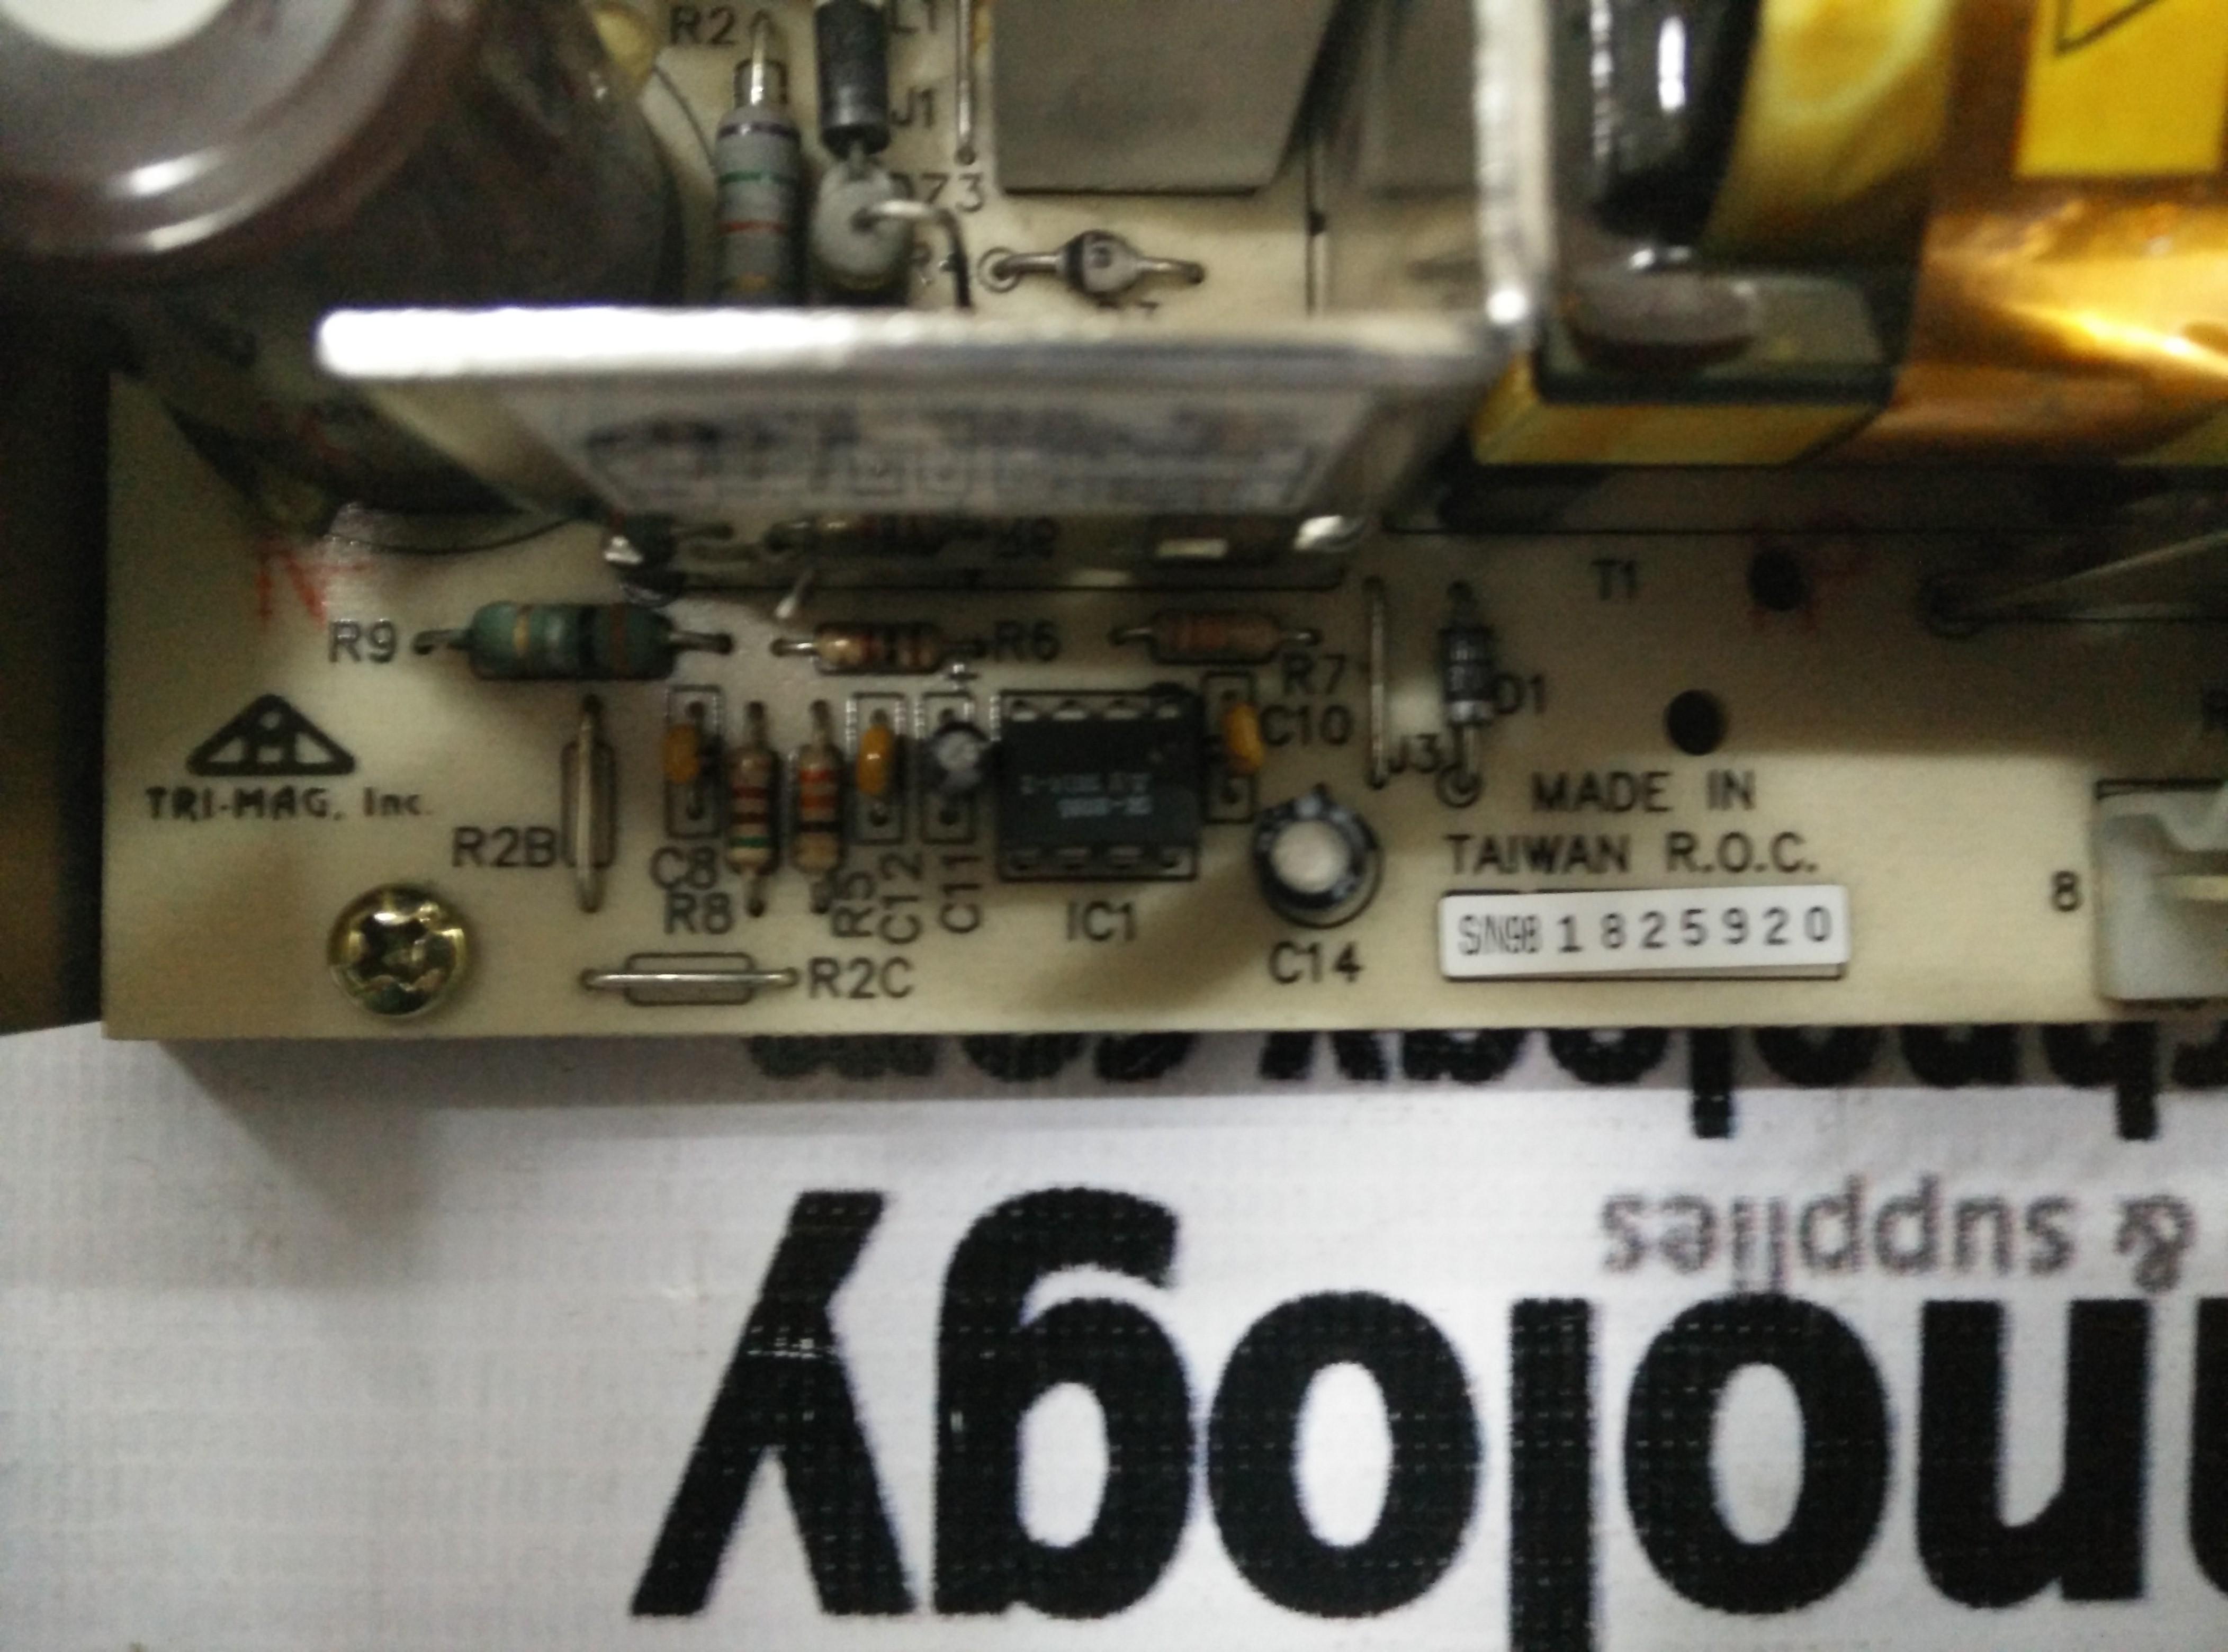 Repair 1825920 TRI-MAG TRI-MAG PCB BOARD in Malaysia, Singapore, Thailand, Indonesia